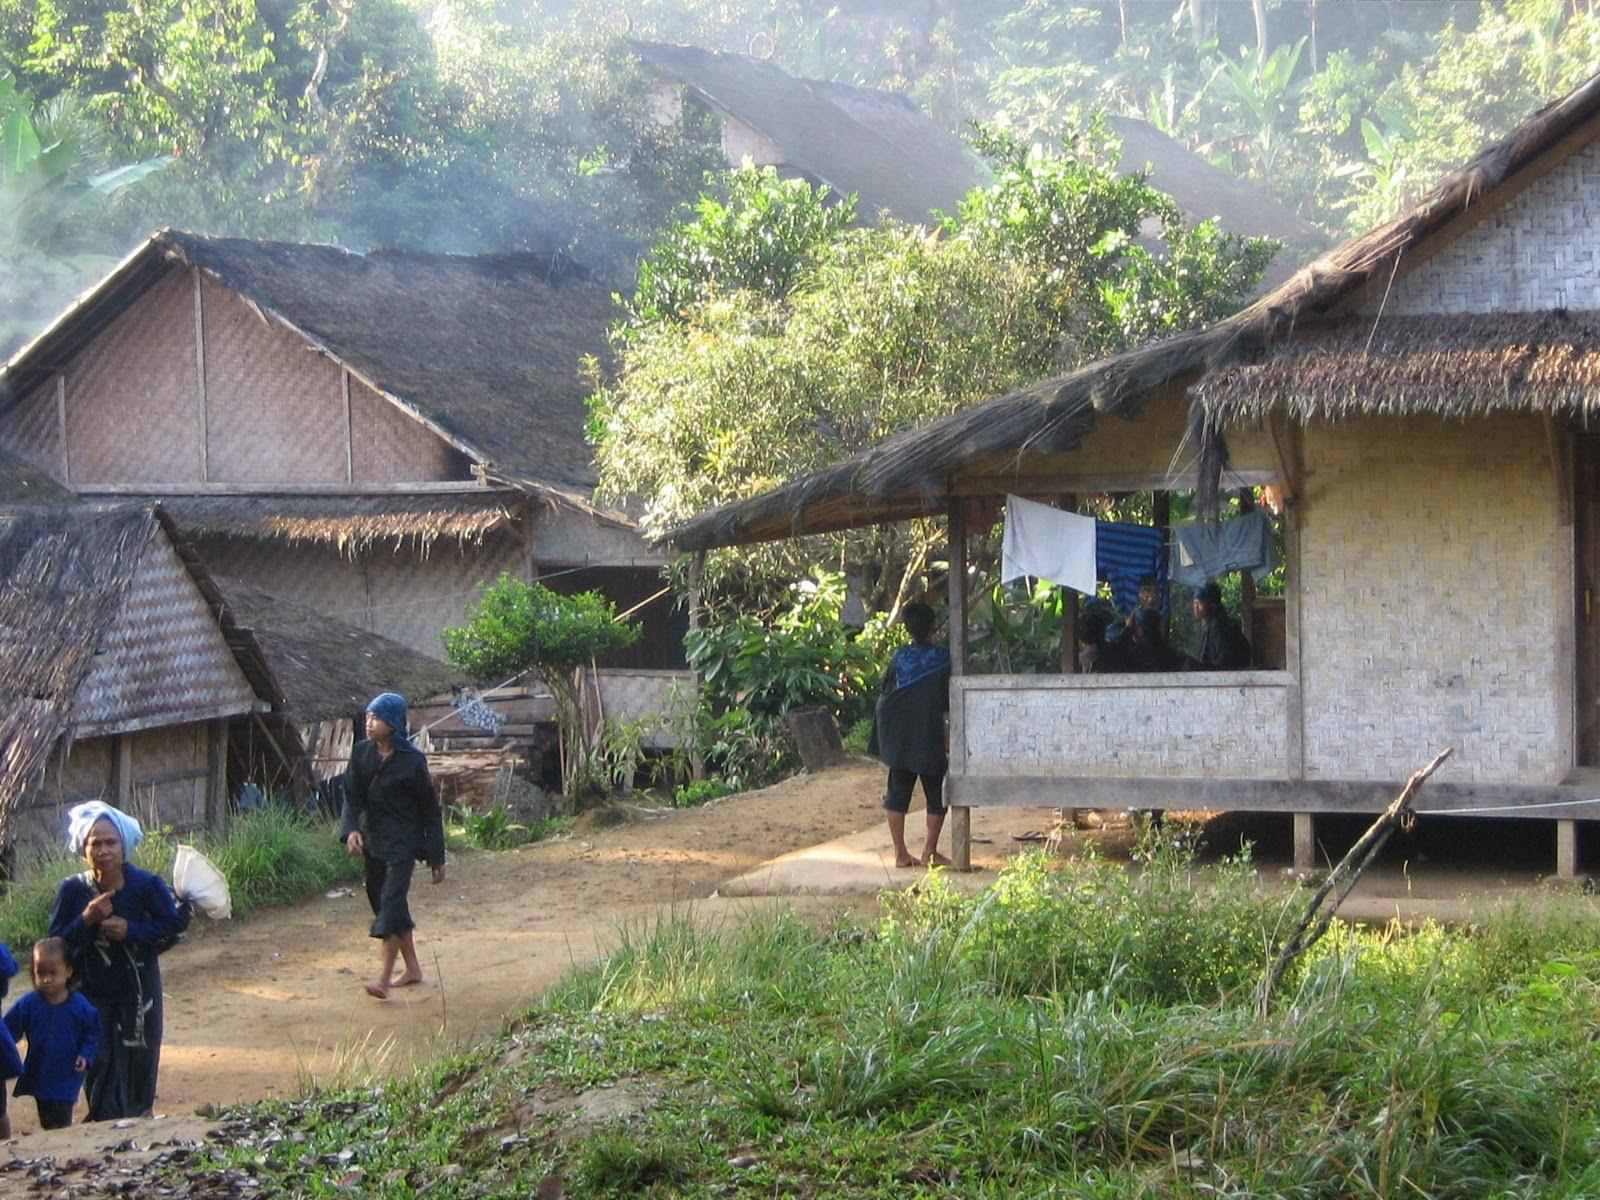 Mengenal Rumah Adat Suku Baduy Dalam